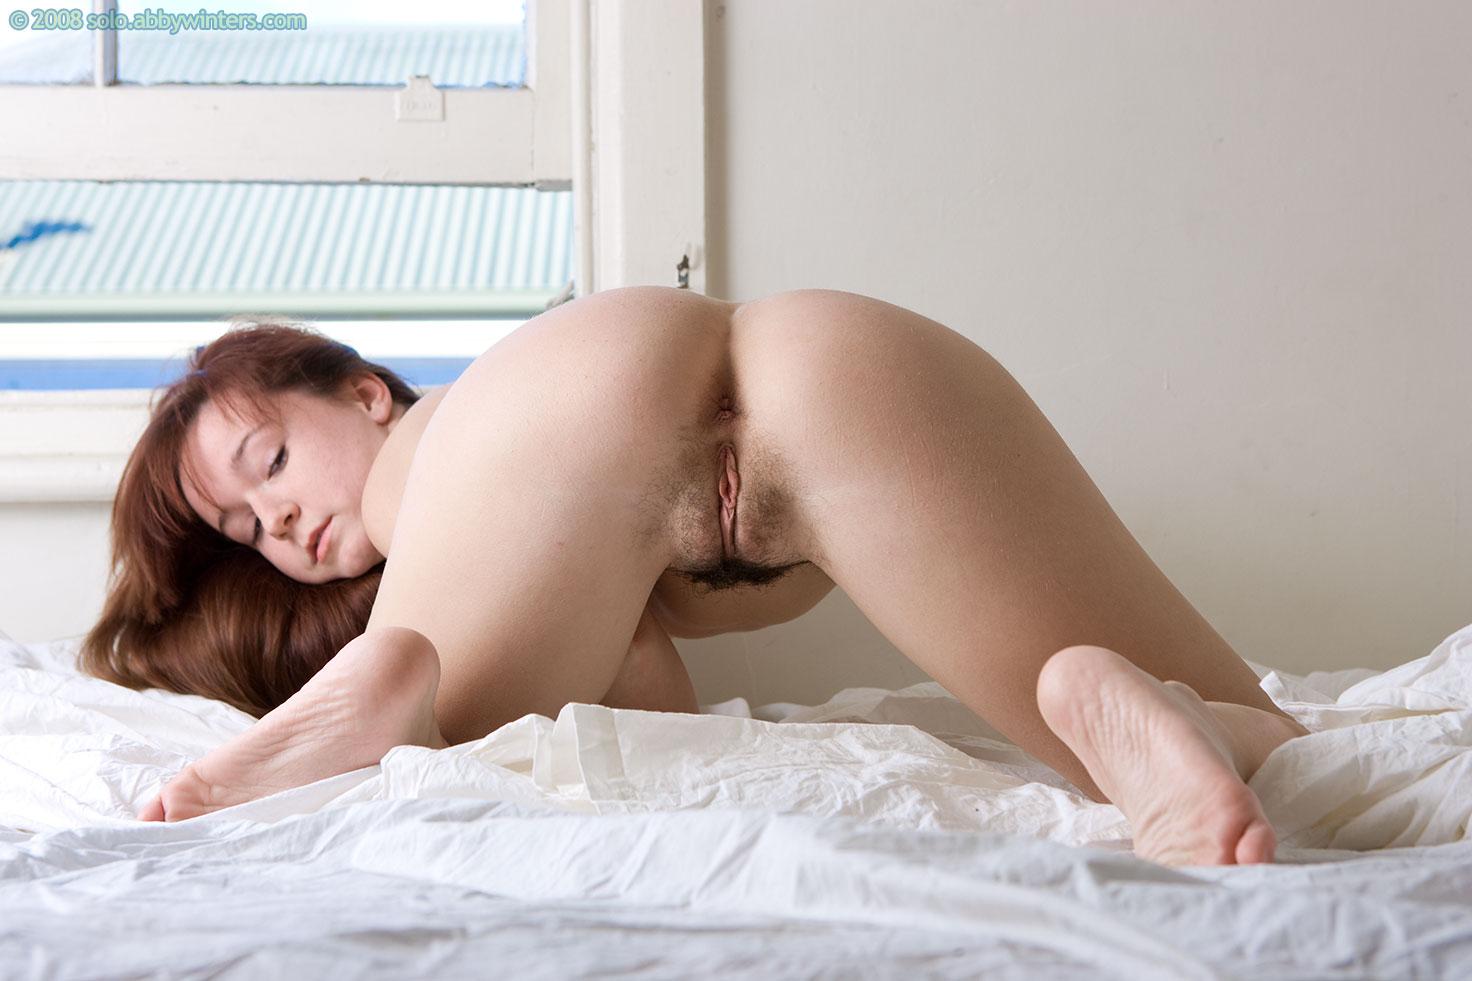 Annabelle lee porn videos